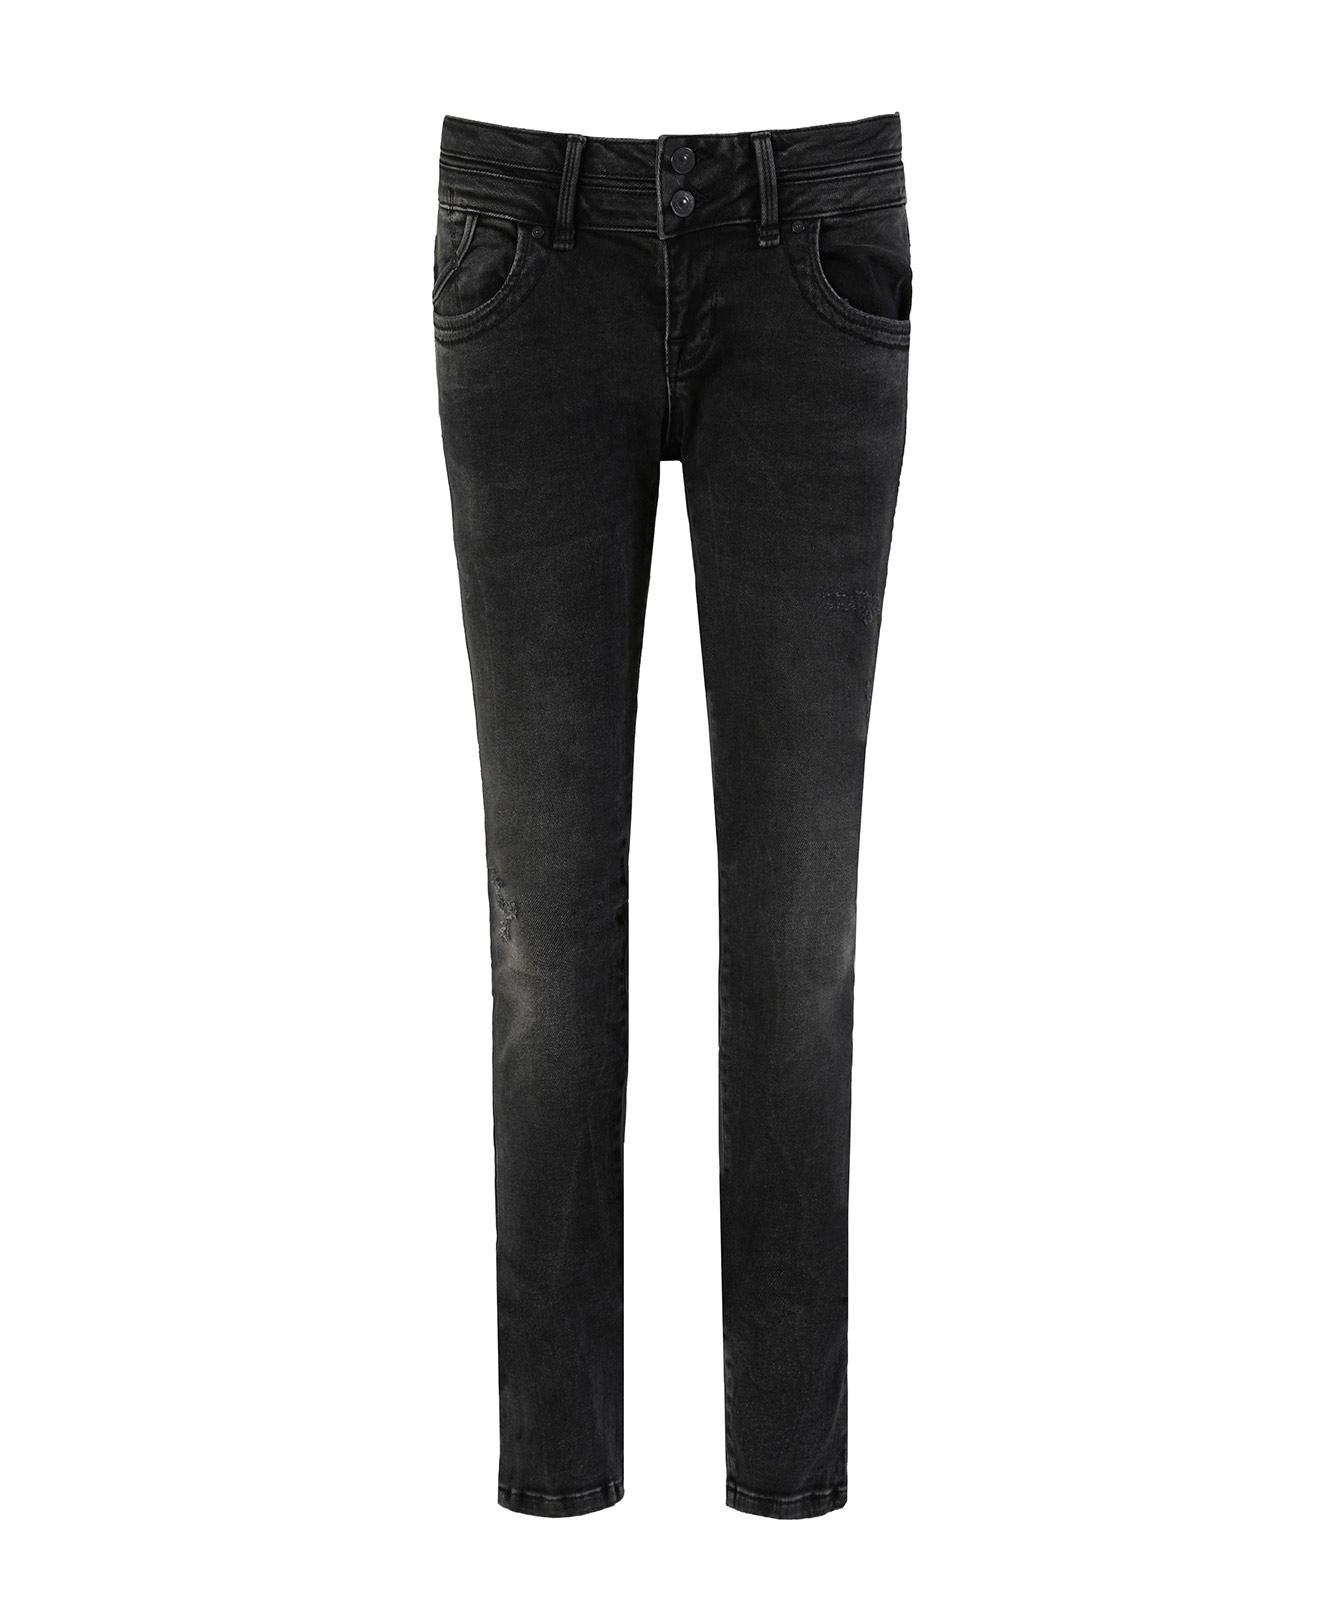 Hosen - LTB Skinny Jeans Julita X in Dolly  - Onlineshop Jeans Meile